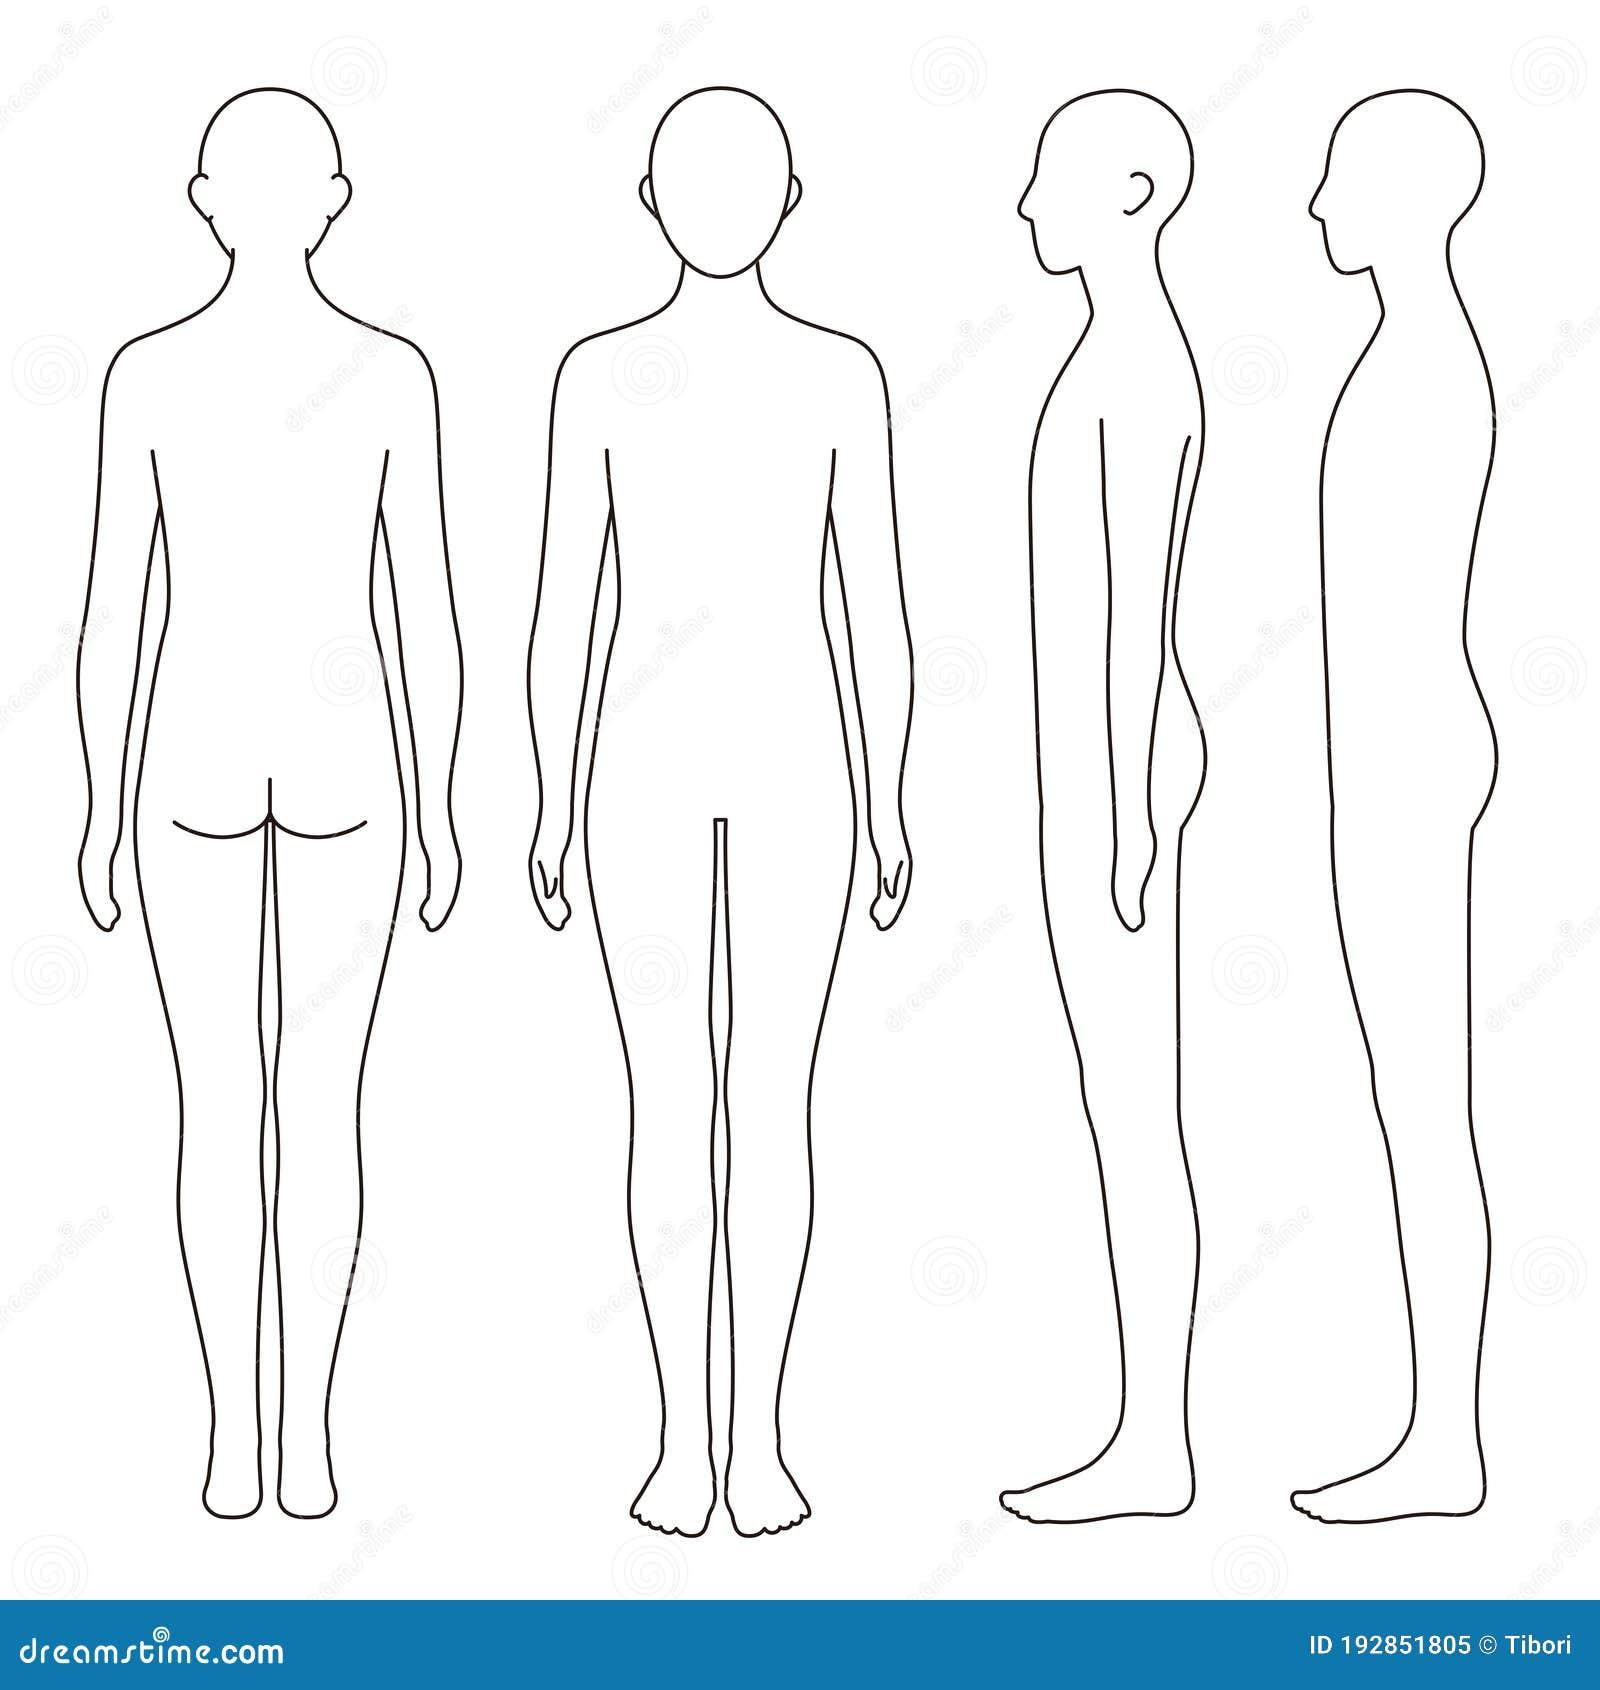 human body outline front back stock illustrations – 496 human body outline  front back stock illustrations, vectors & clipart - dreamstime  dreamstime.com